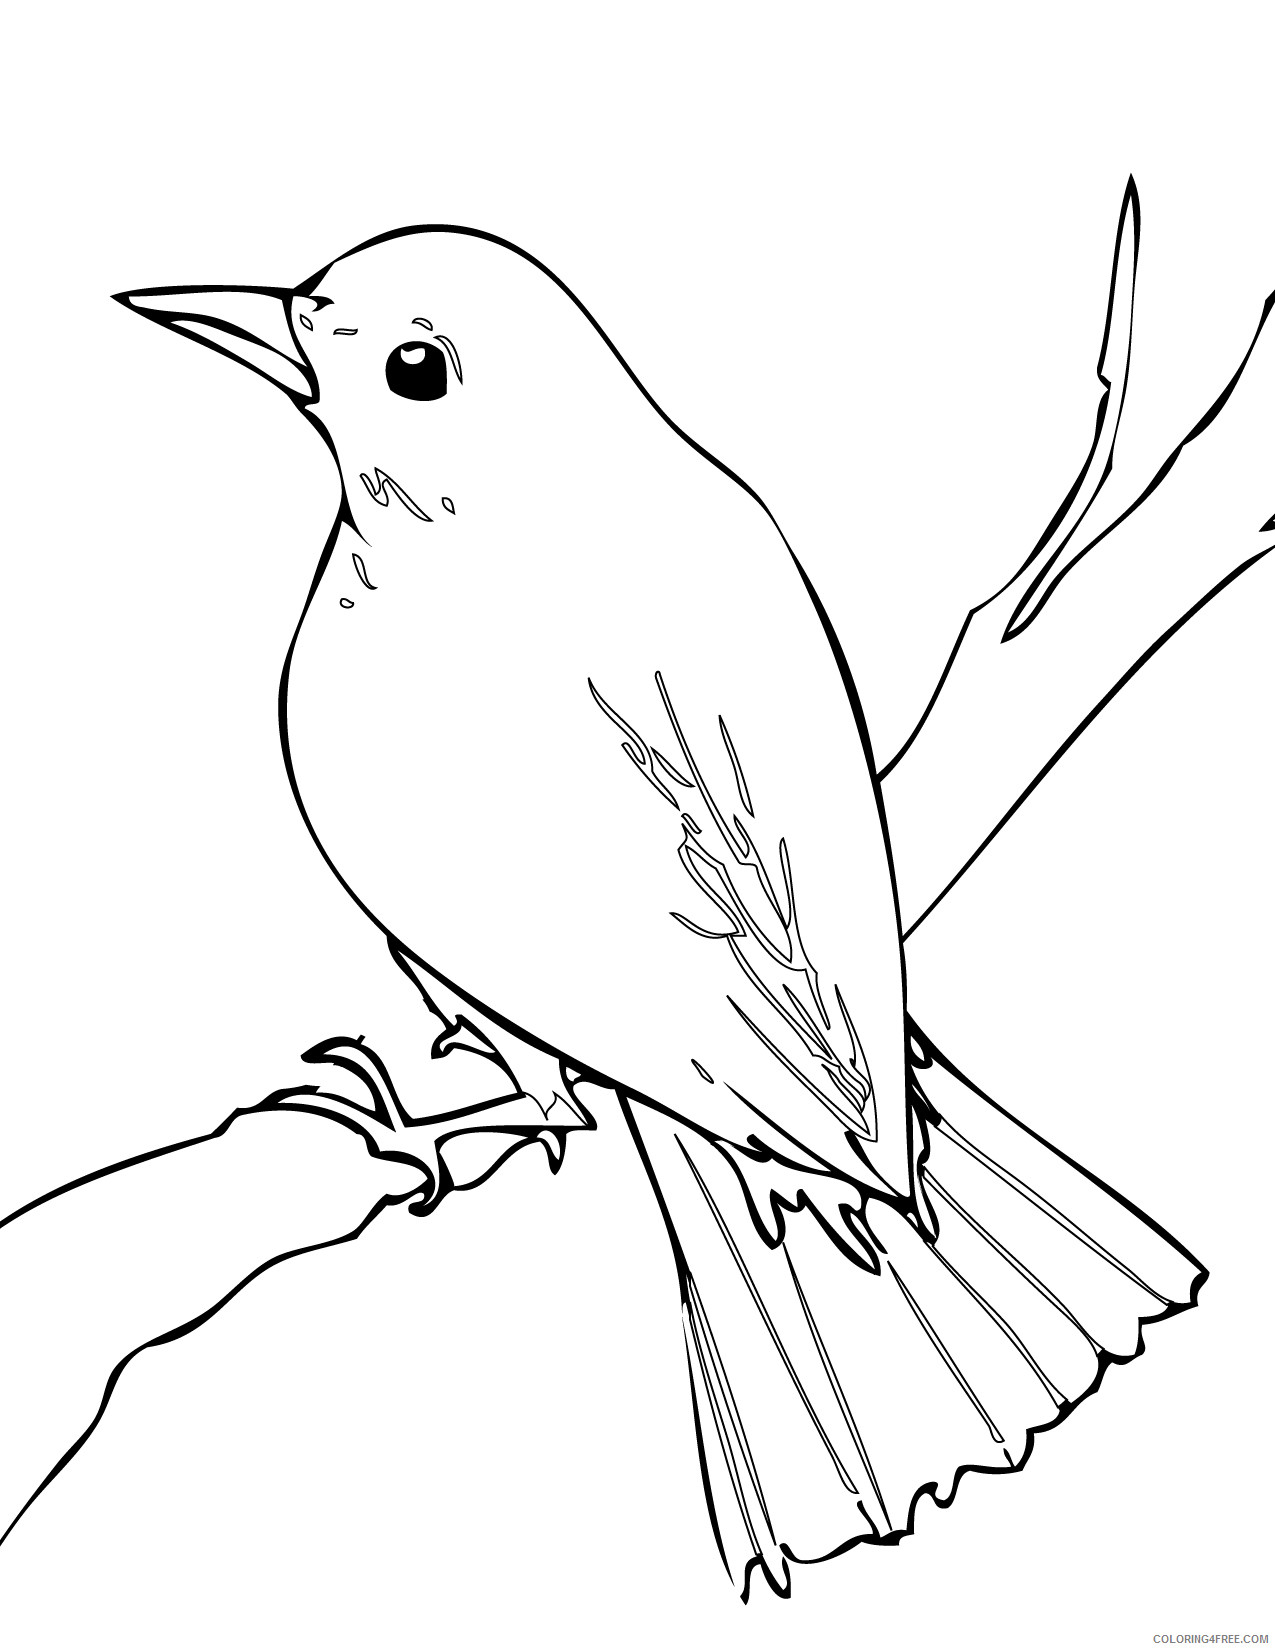 Nightingale Coloring Pages nightingale 62 jpg Printable Coloring4free